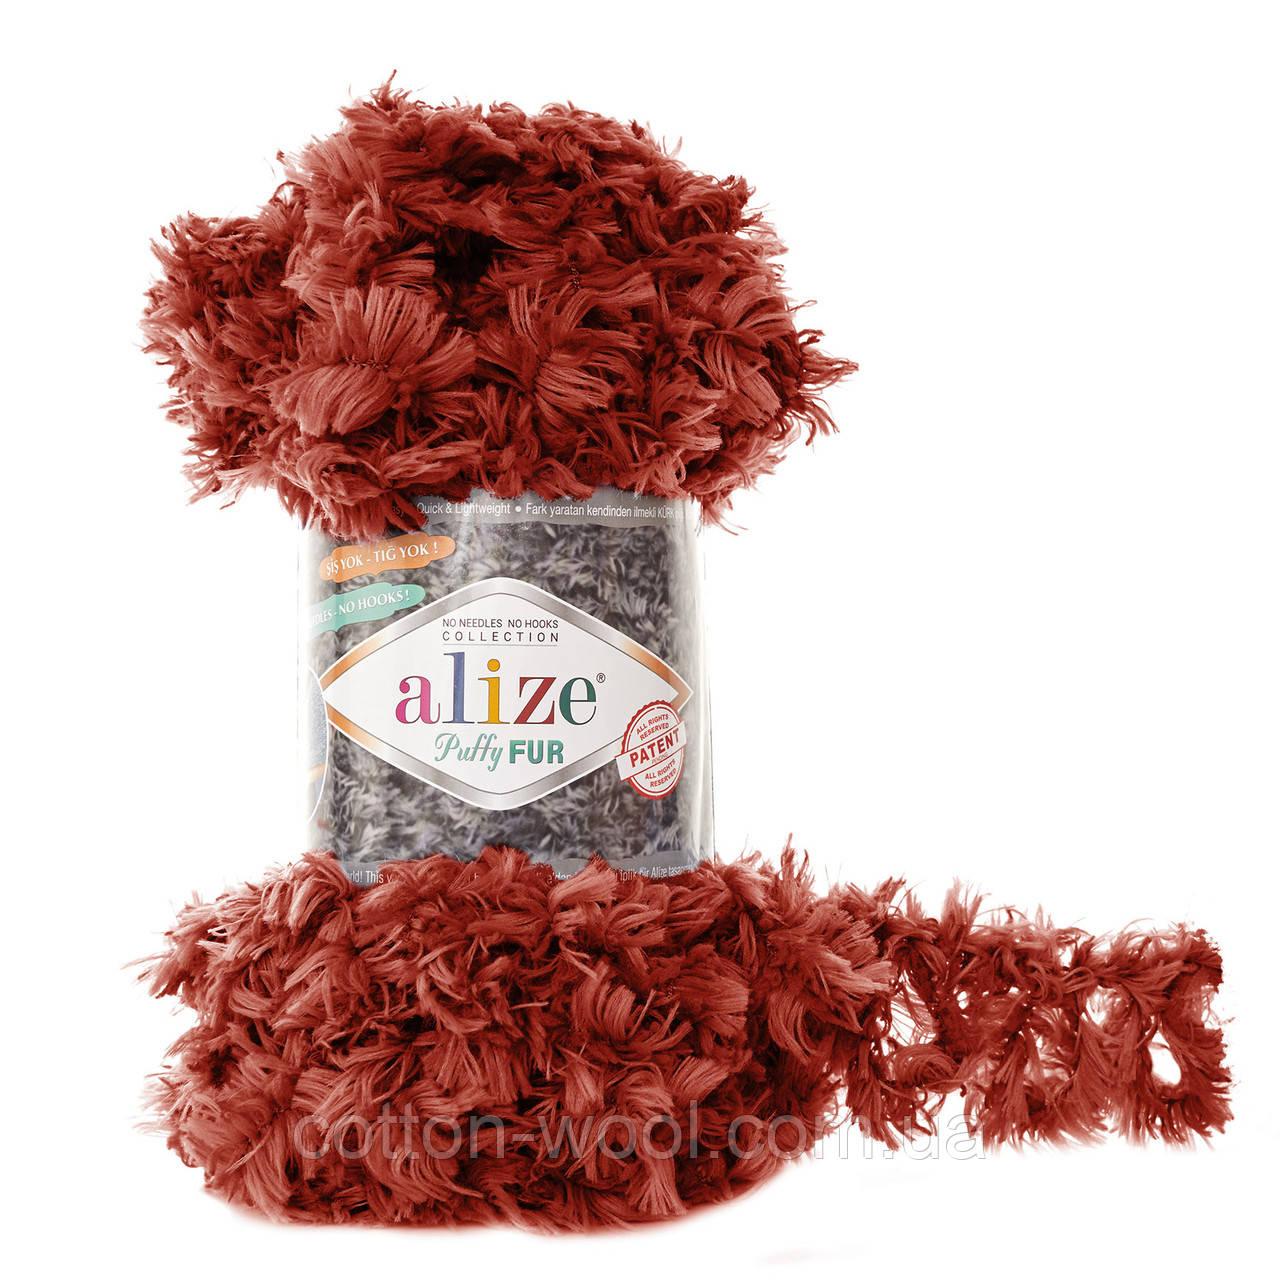 Puffy Fur (Паффі Фур) (100% - поліестер) 6118